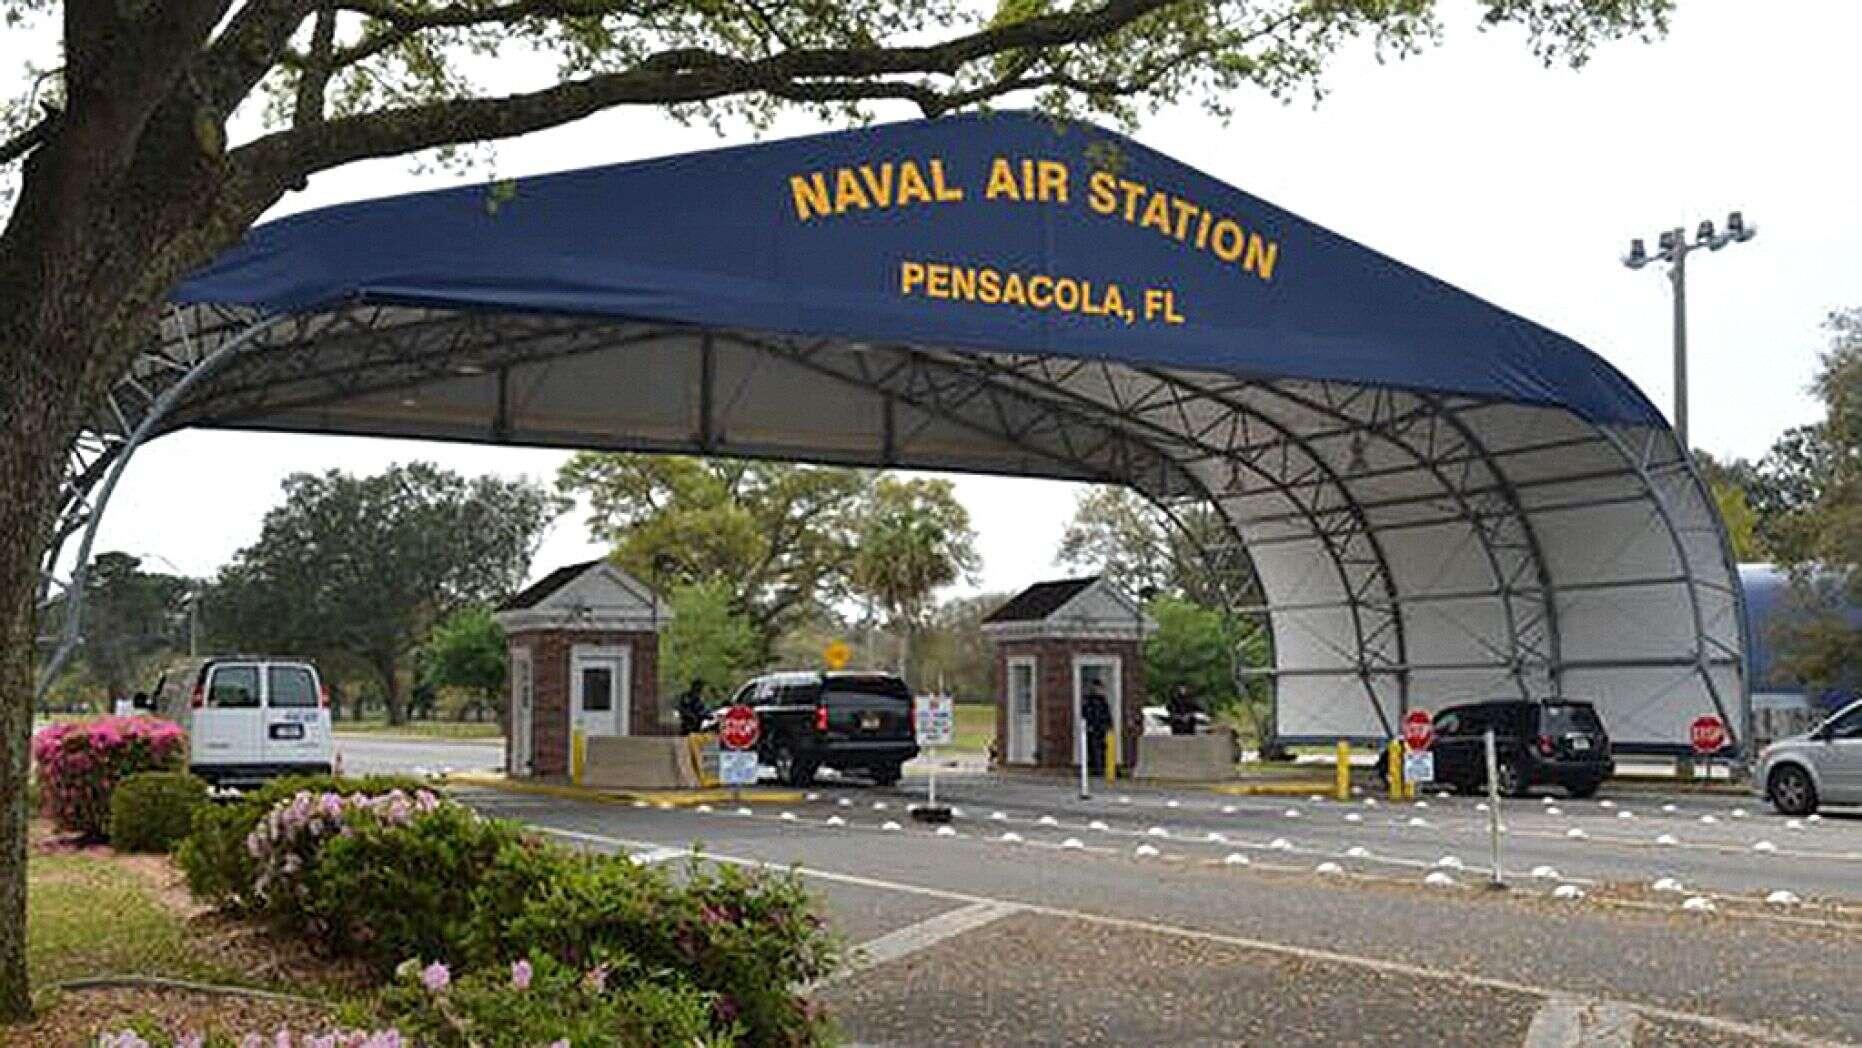 FBI says it presumes Navy base shooting was act of terrorism